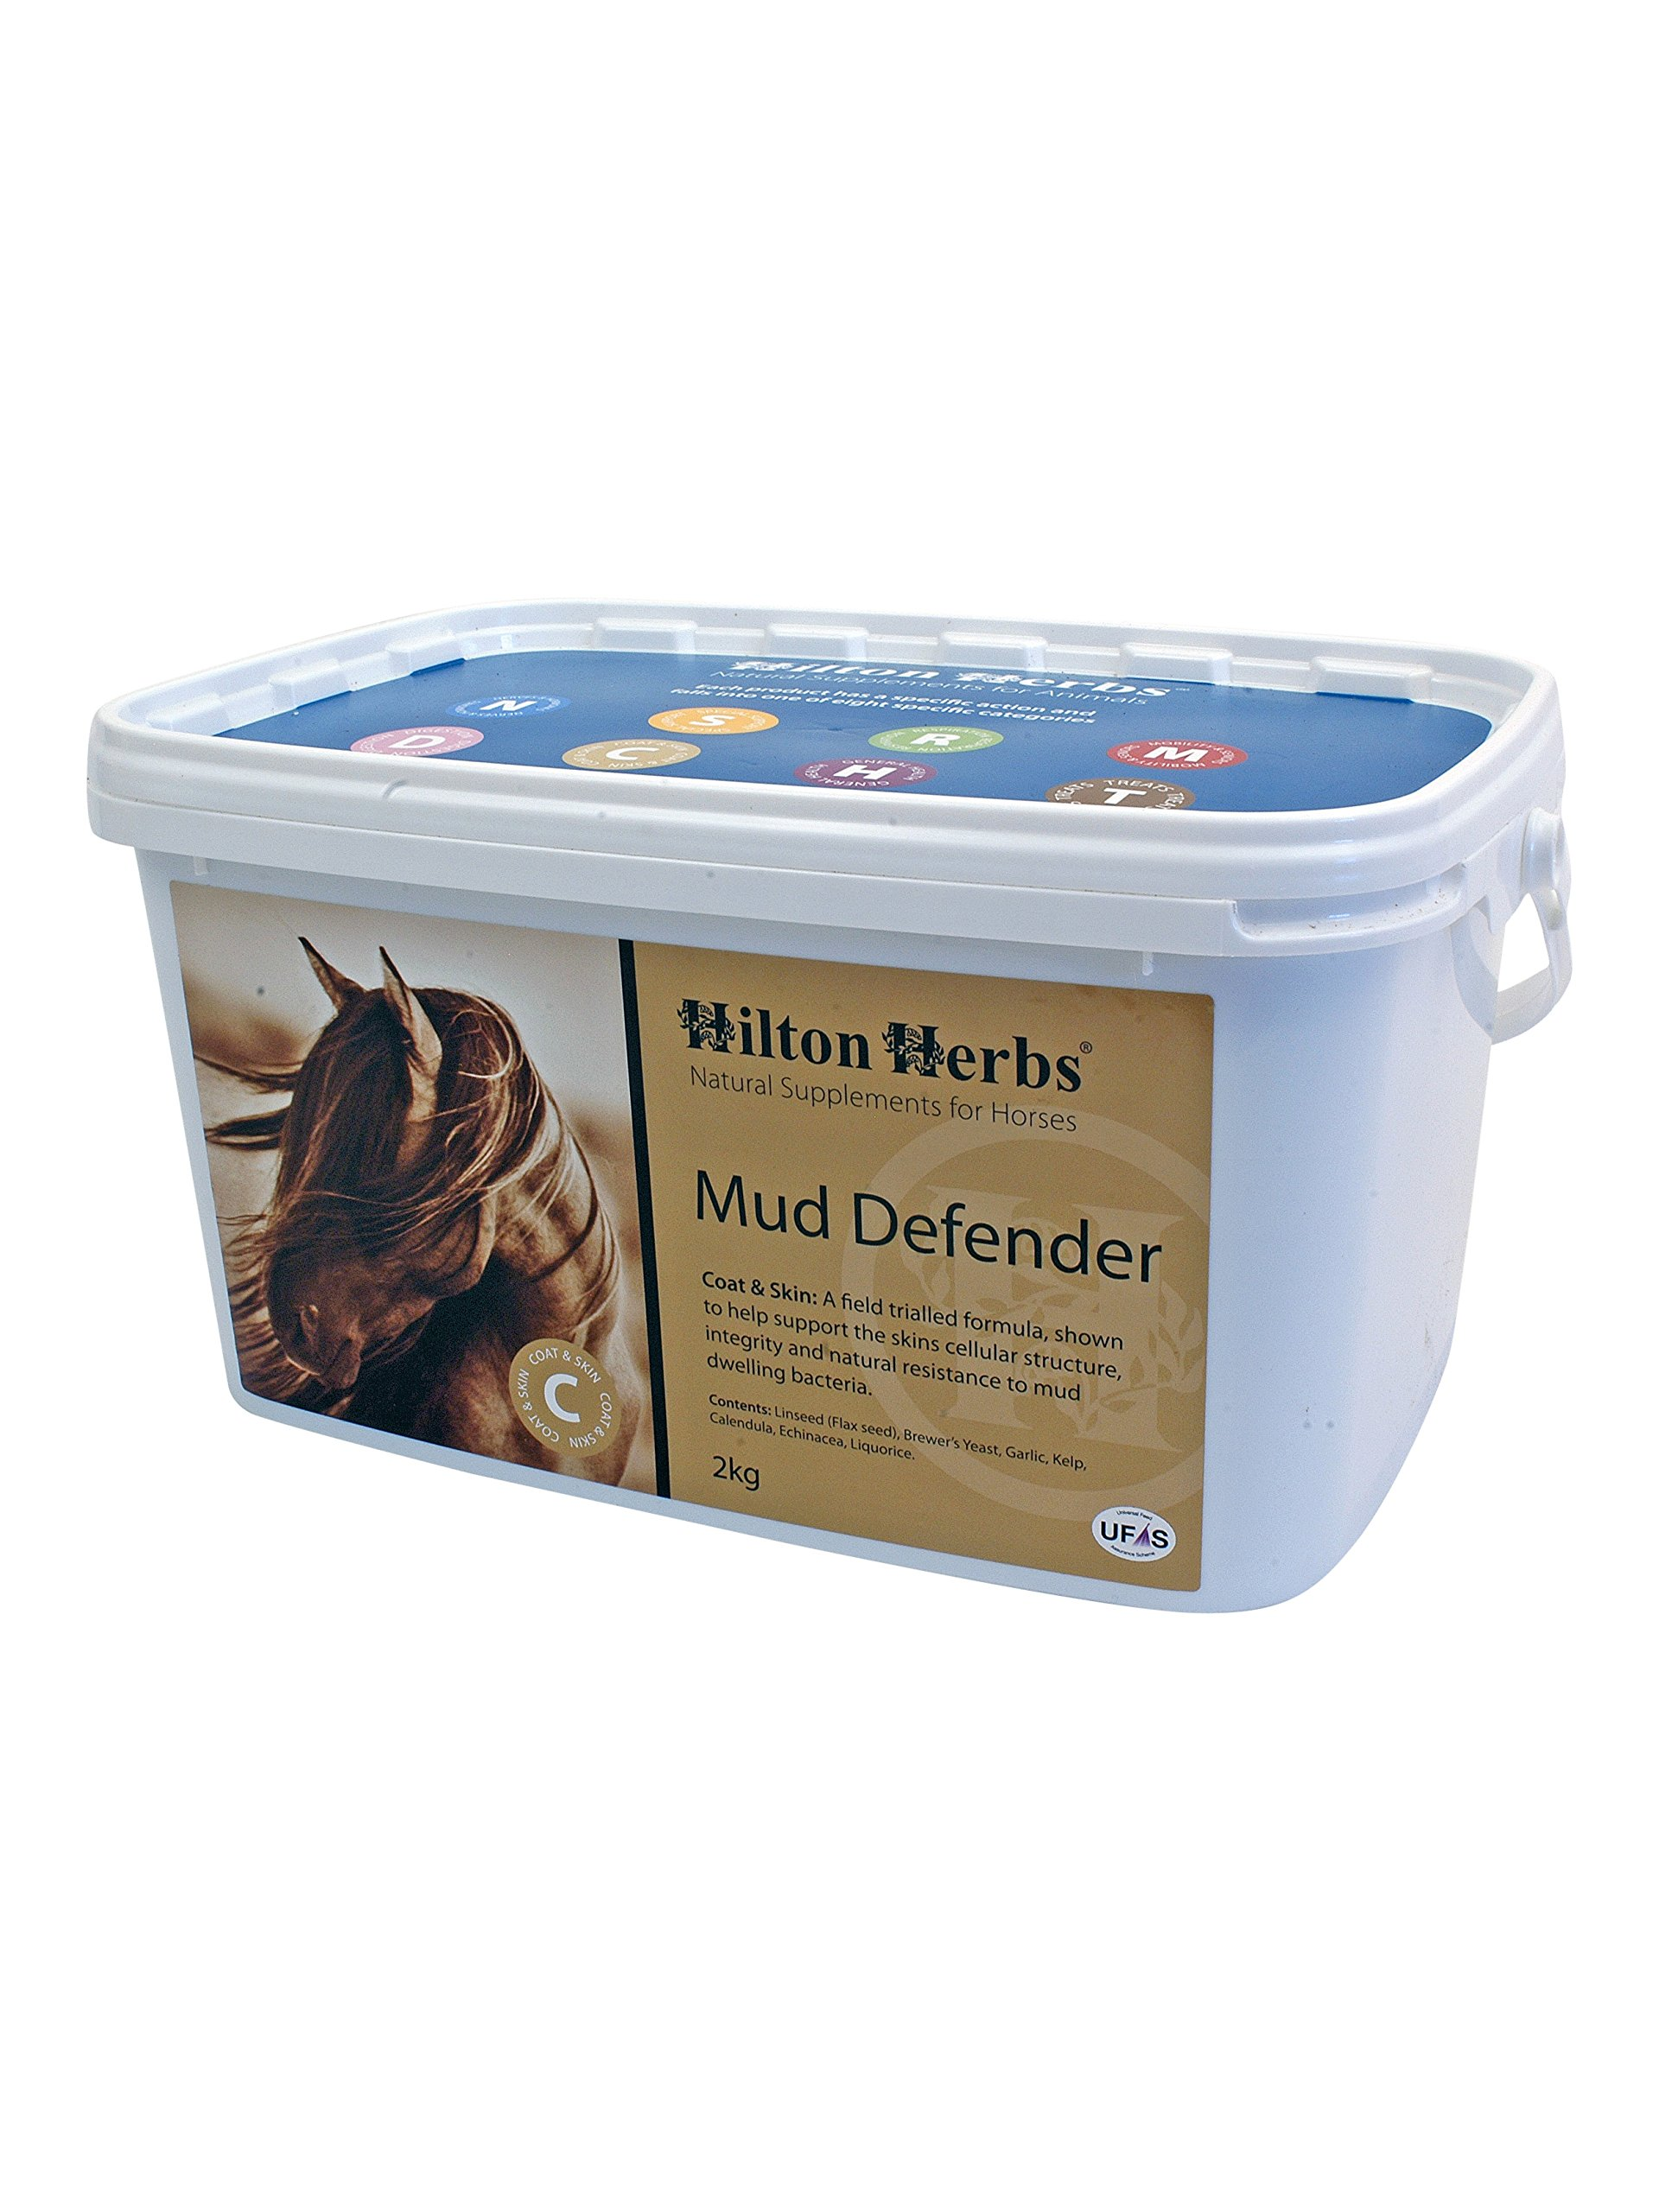 Hilton Herbs Mud Defender 4.4 lb Bag